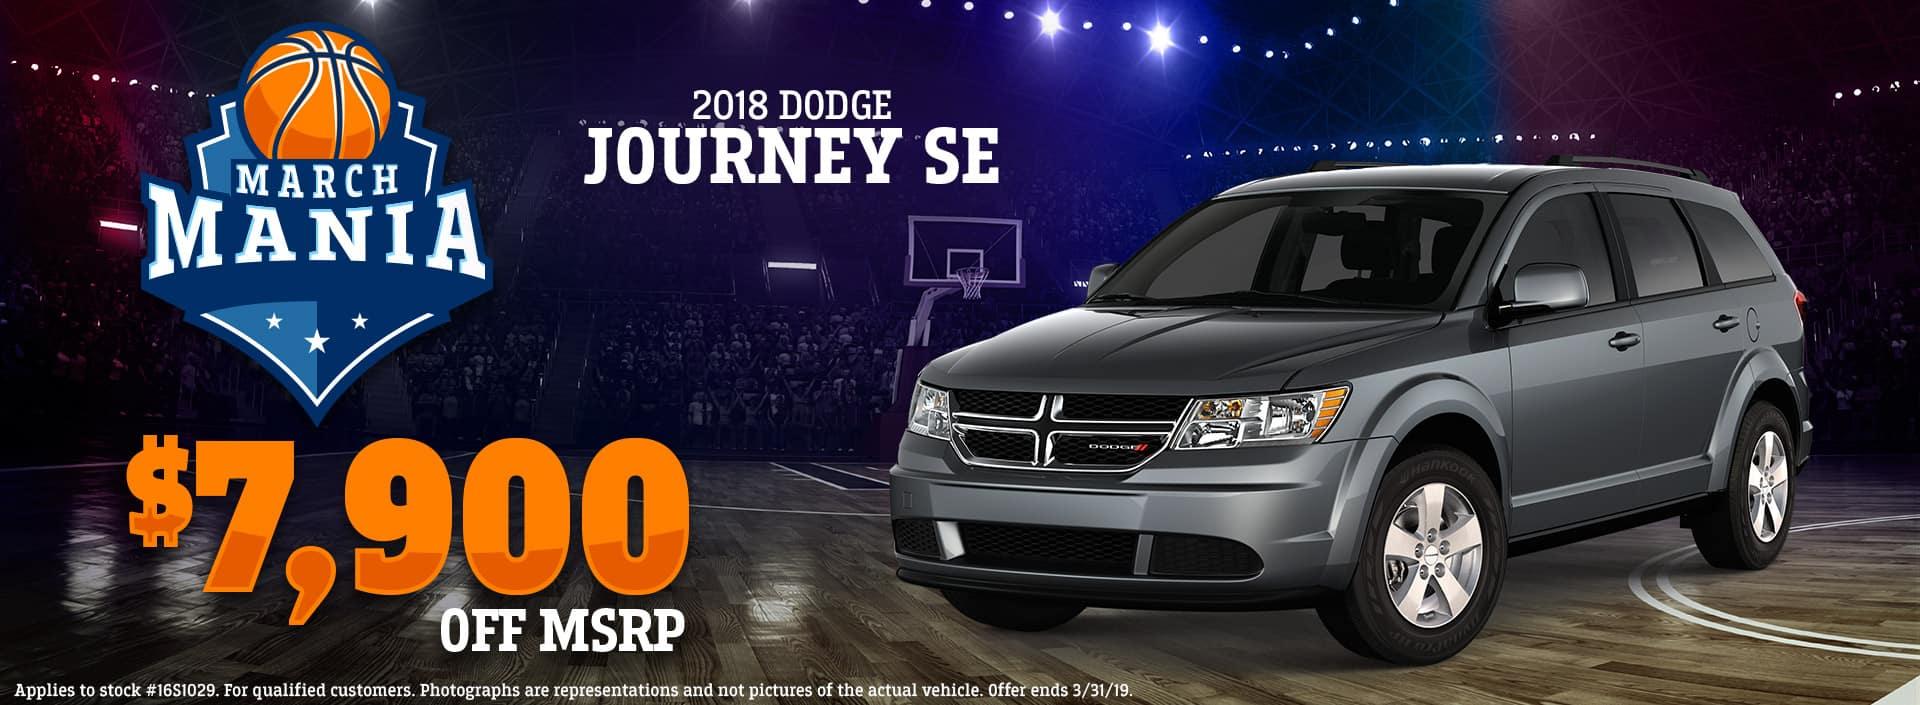 3.19 - 2018 Dodge Journey SE